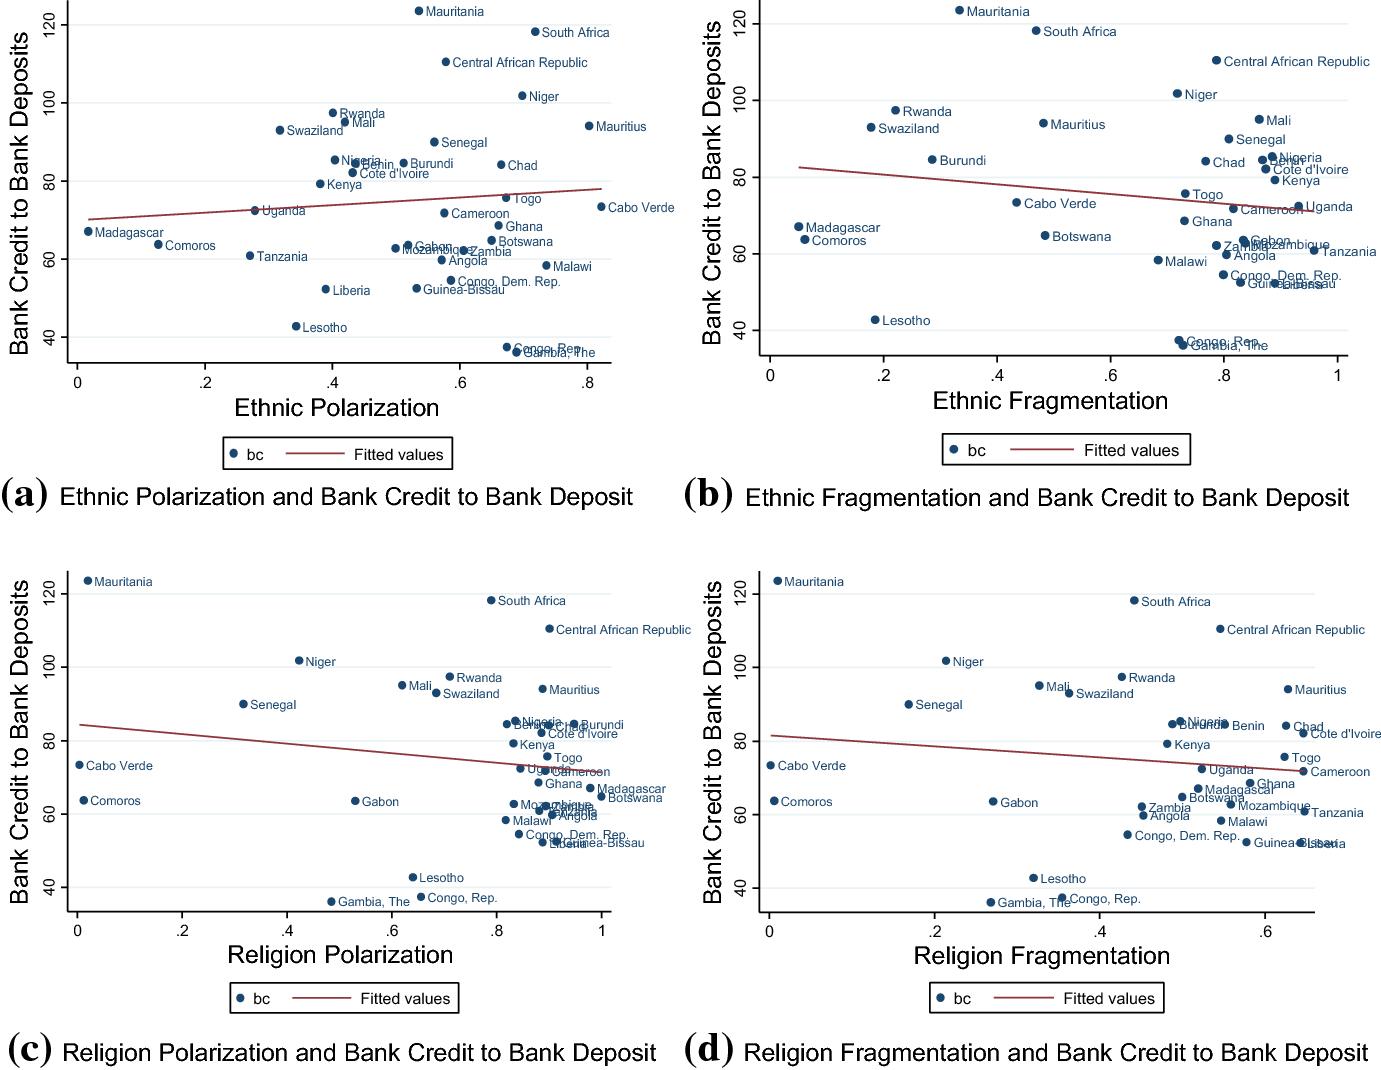 Fragmentation and financial development in Sub-Saharan Africa